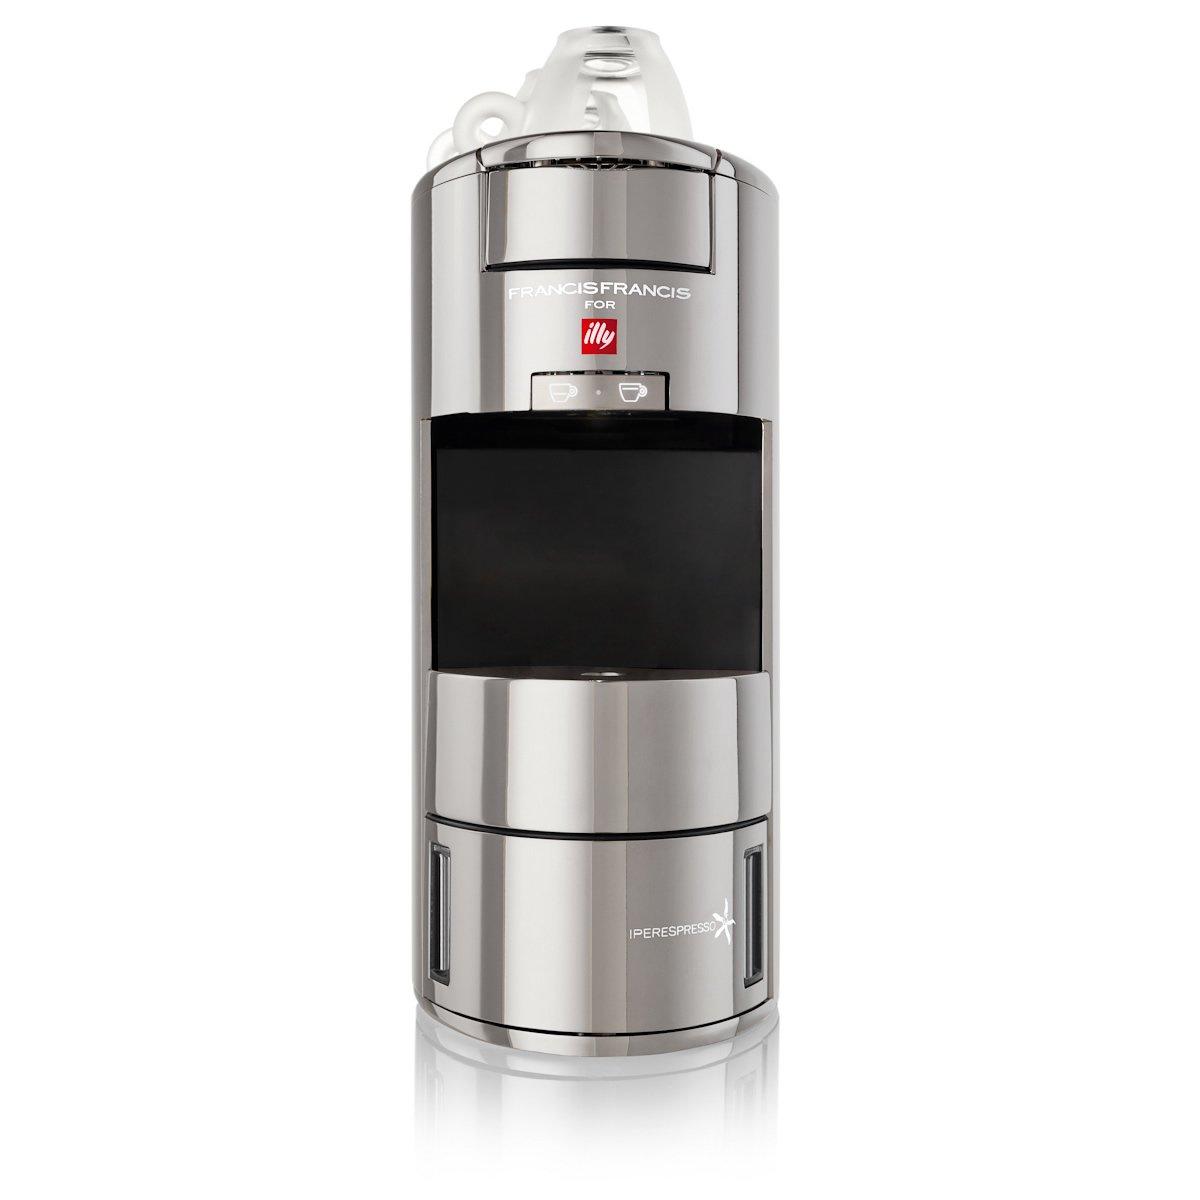 Illy X9 IPERESPRESSO - Caffettiere (freestanding, macchina da caffè ...